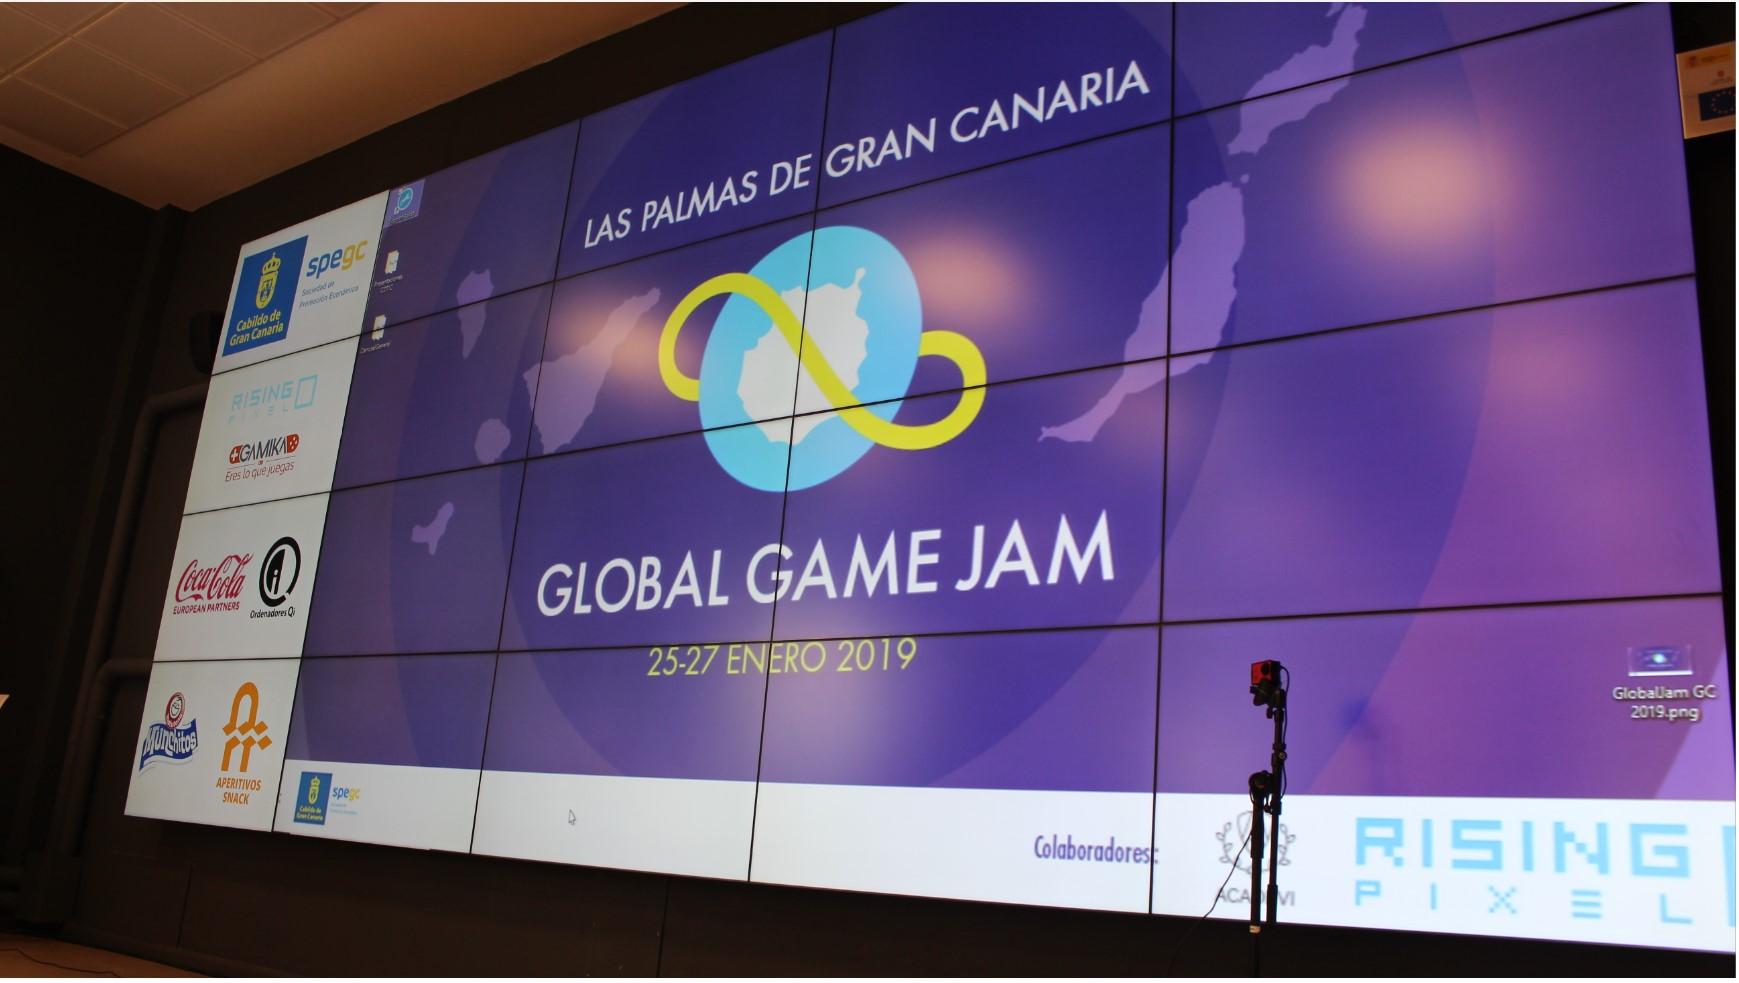 Comienza la Global Game Jam 2019